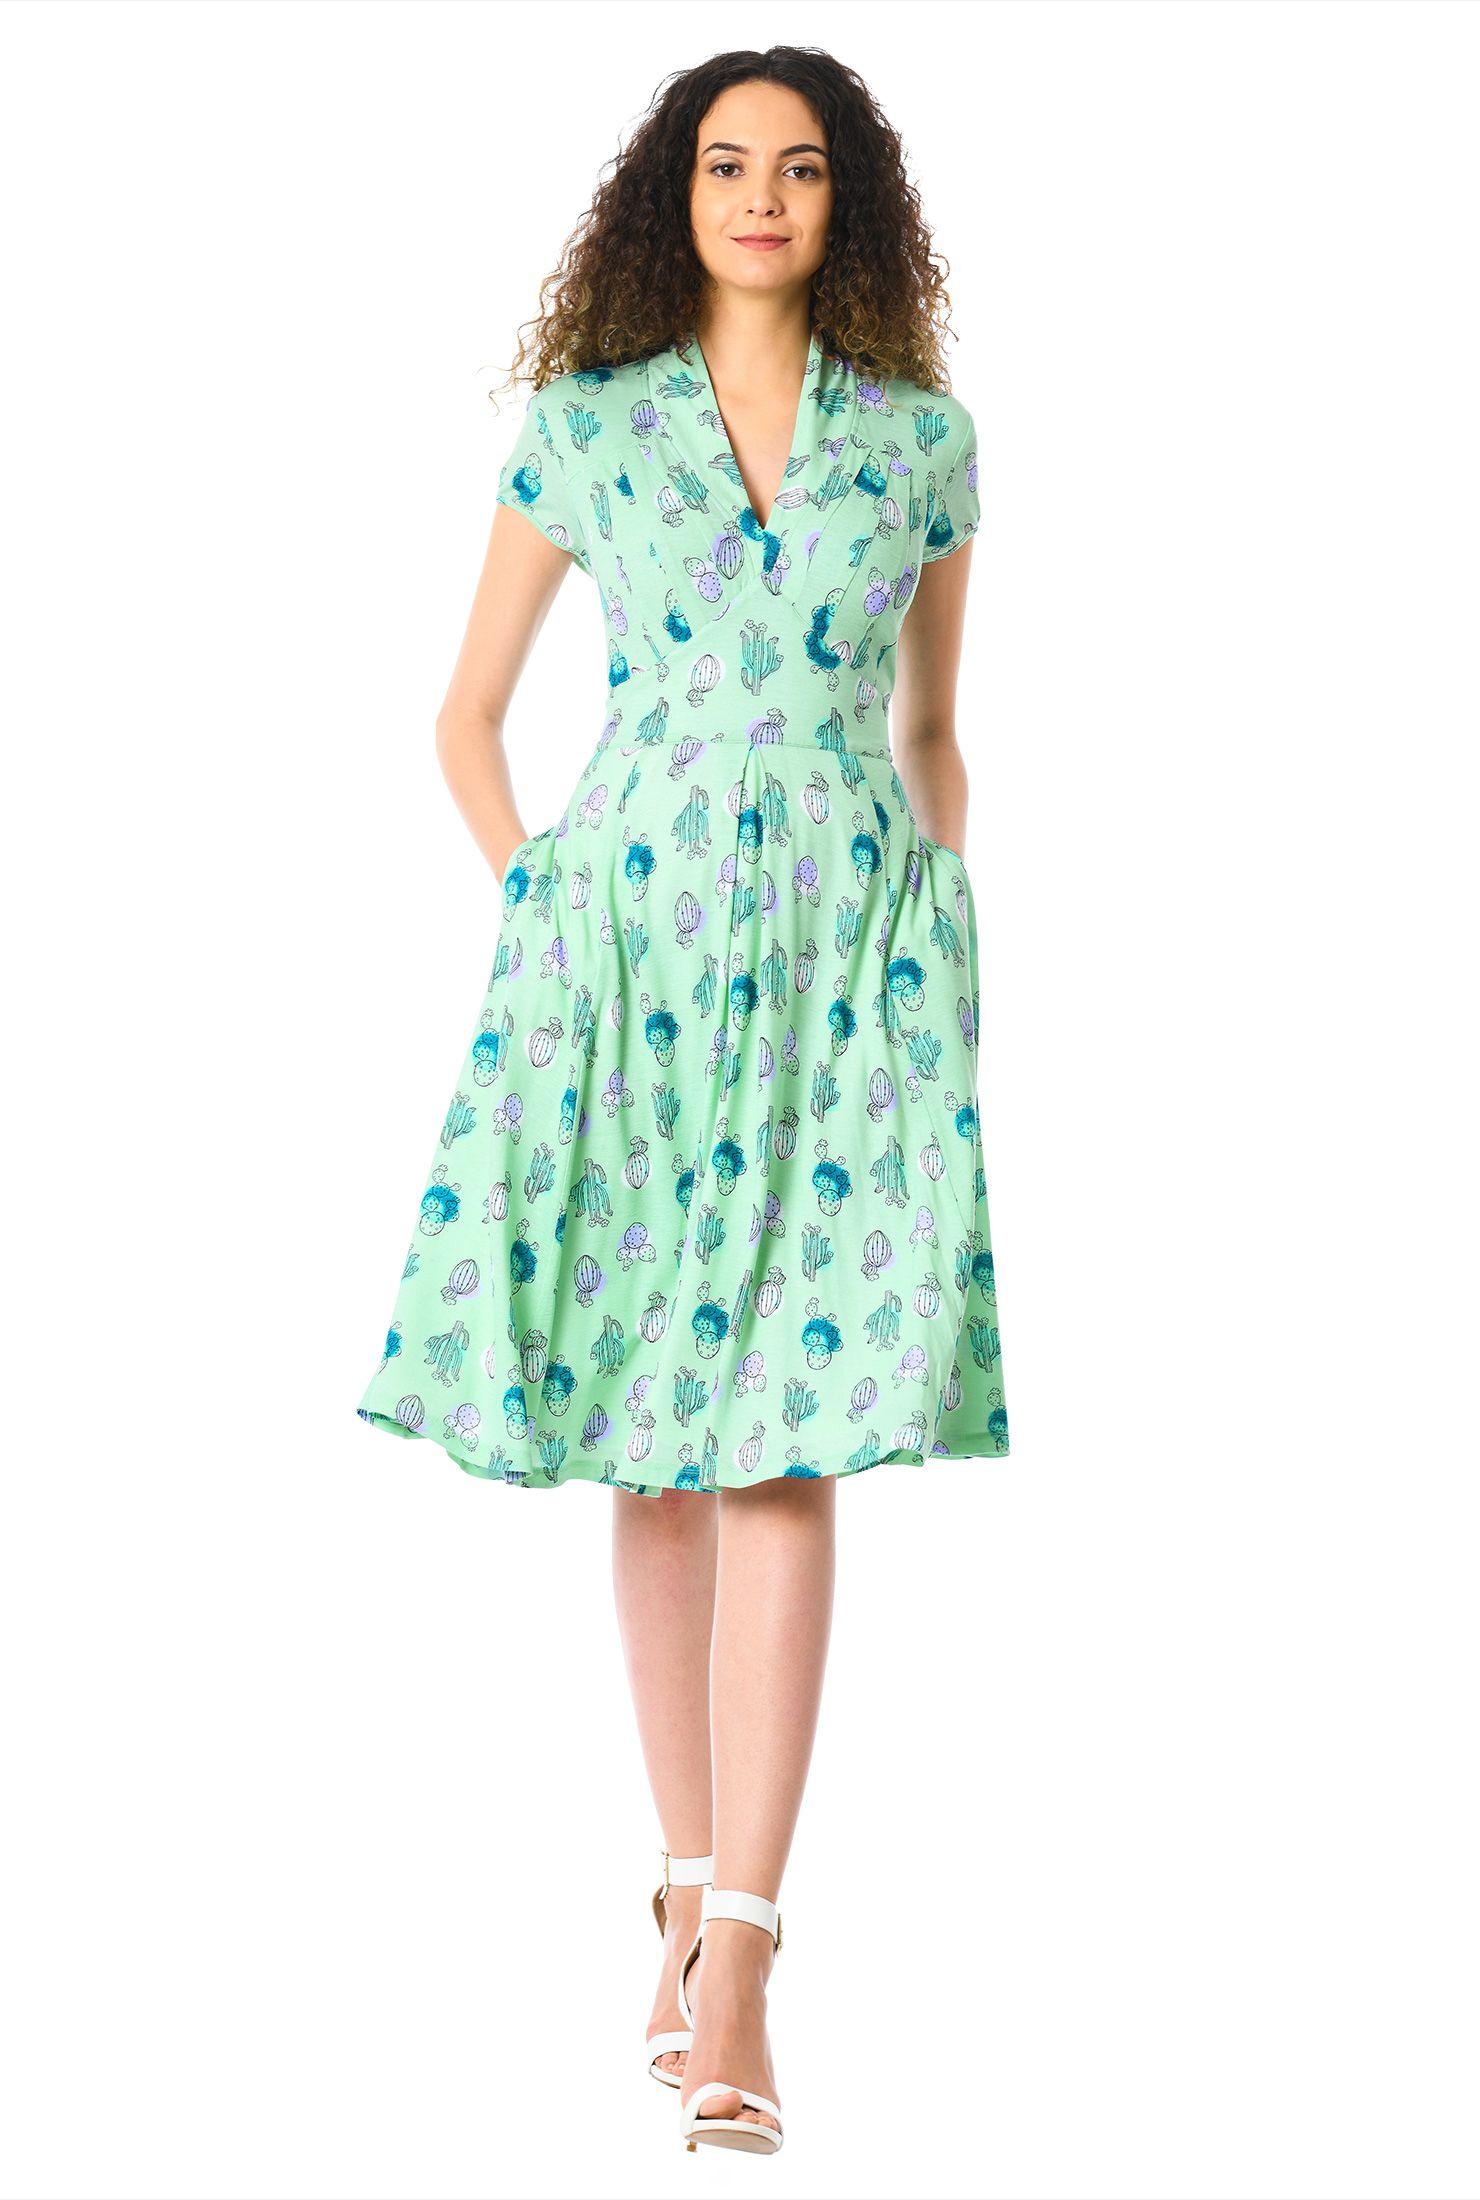 f23bd5c902c4 below knee length dresses, cap sleeve dresses, cotton/spandex Dresses, empire  waist dresses, feminine dresses, Fit and flare dresses, High back neck  dresses ...